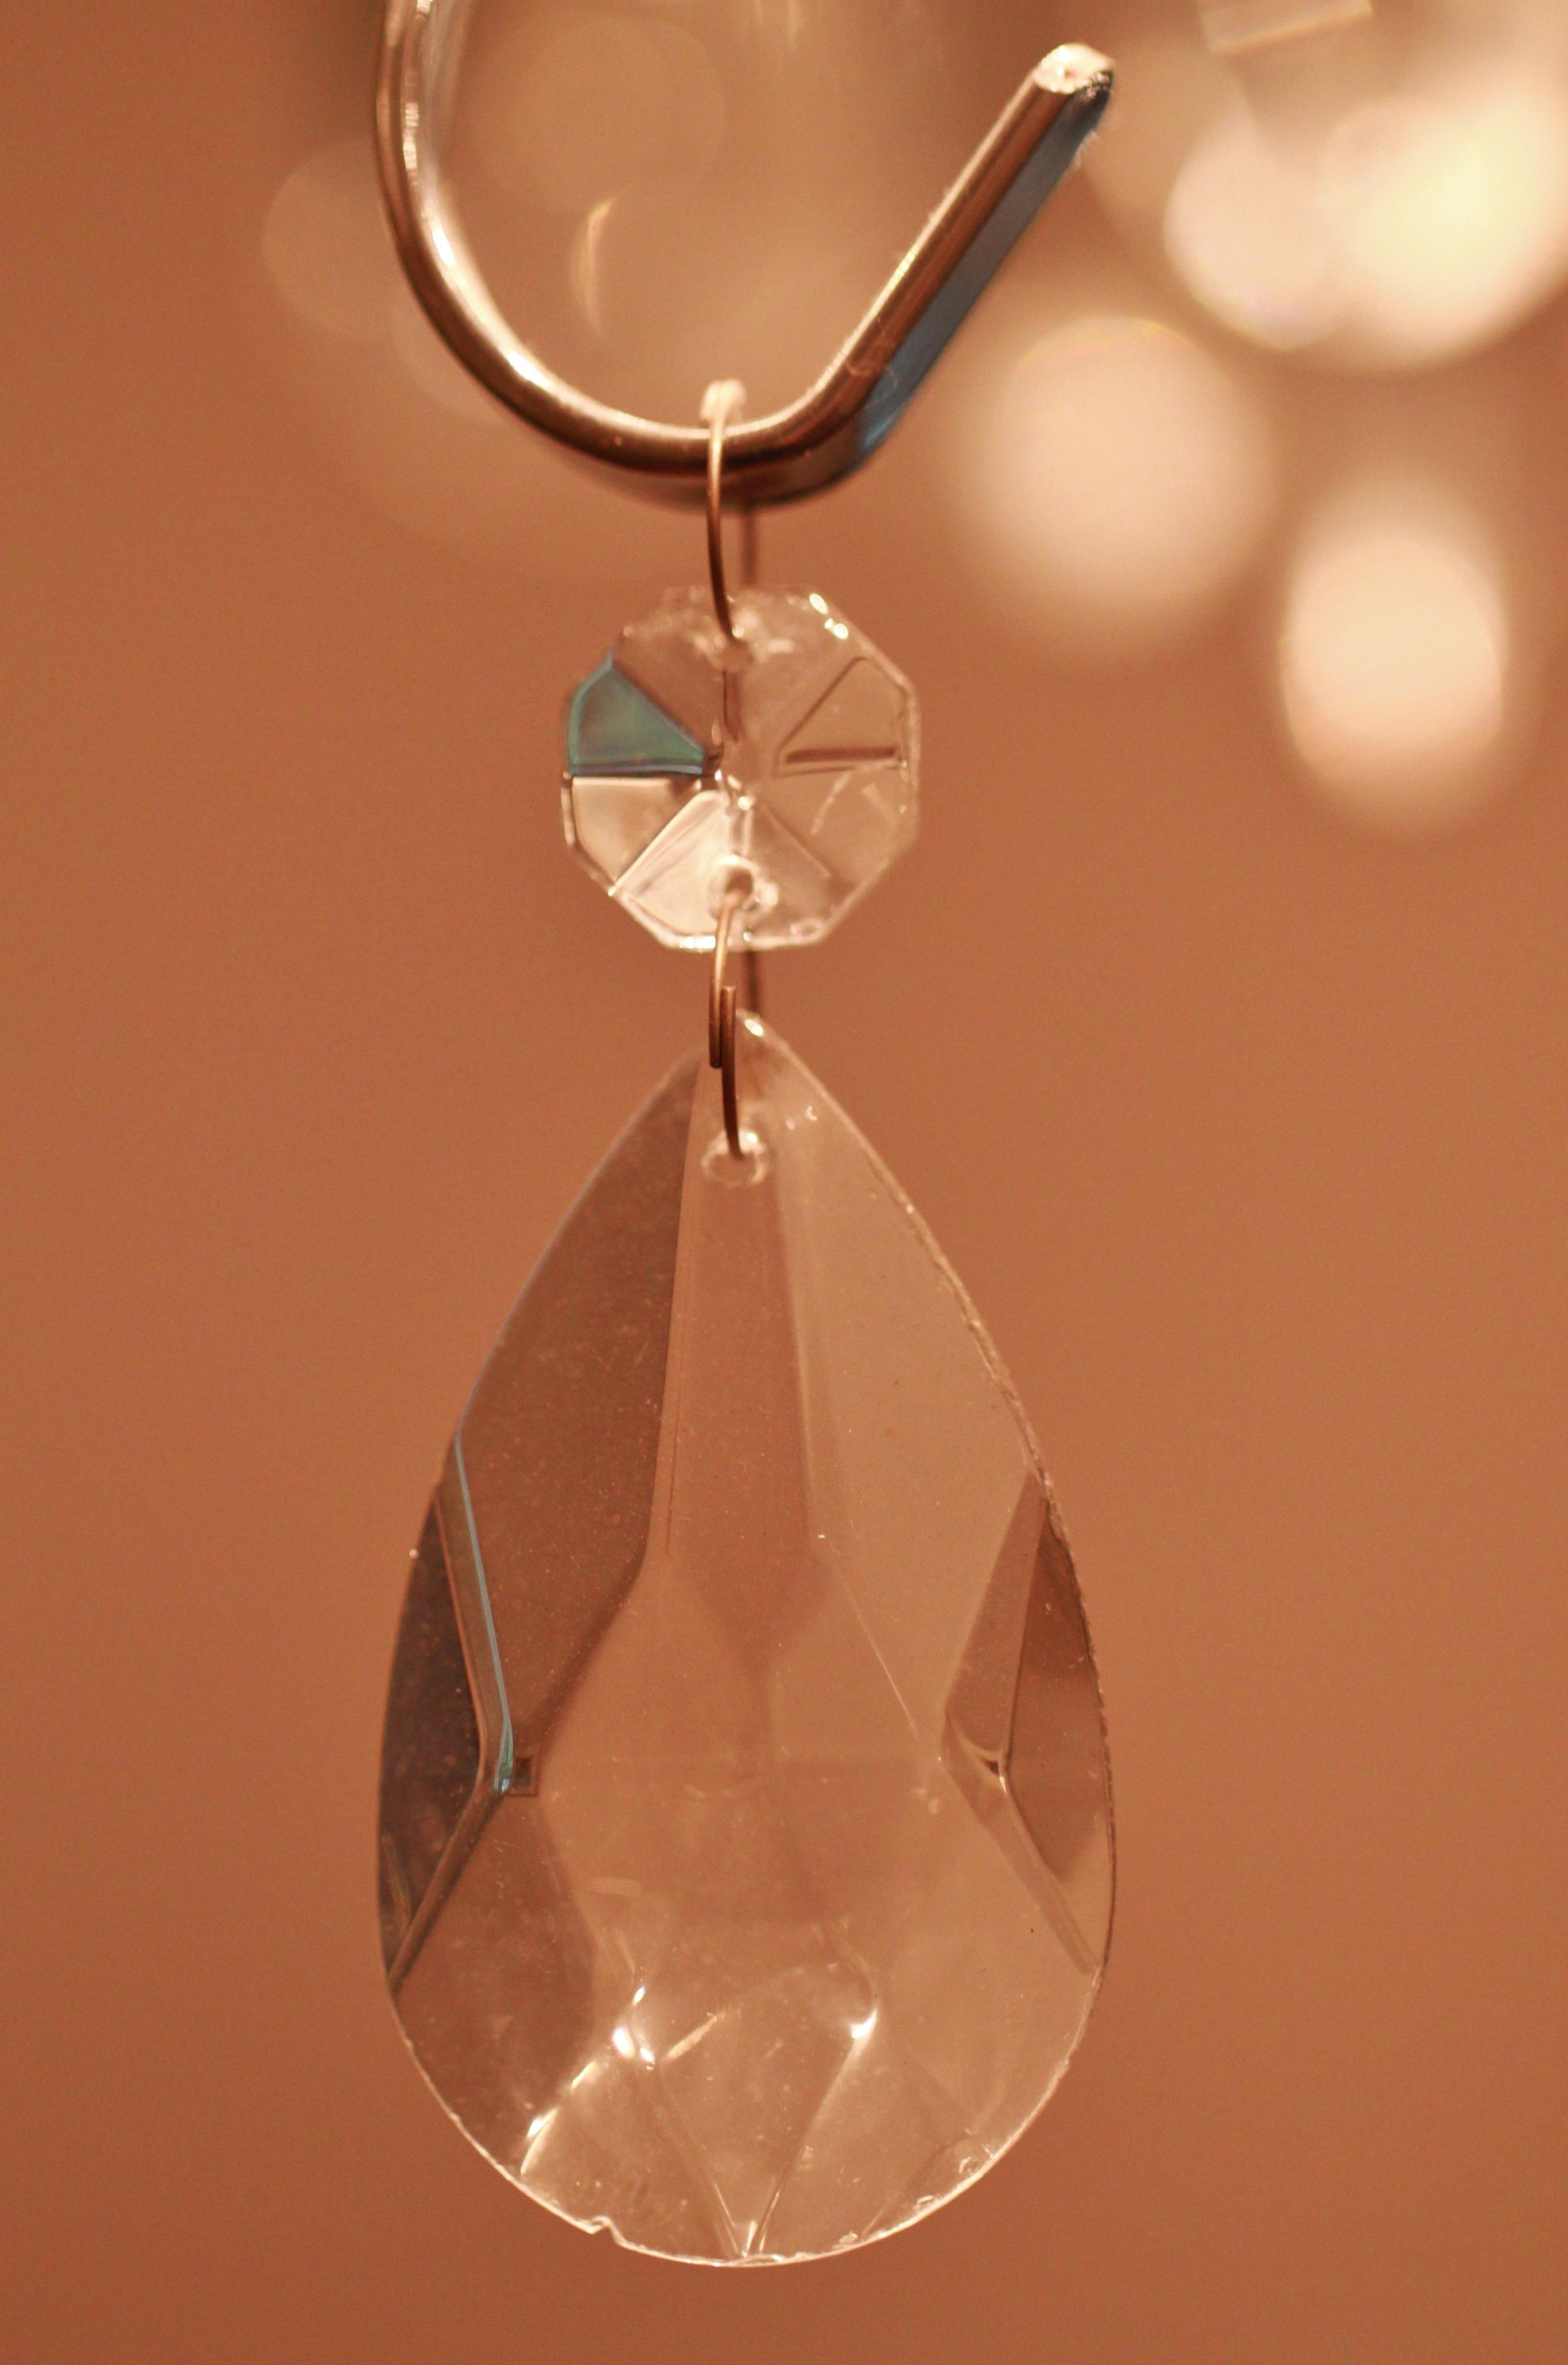 Free Images : light, ground, decoration, close, lighting, decor ...